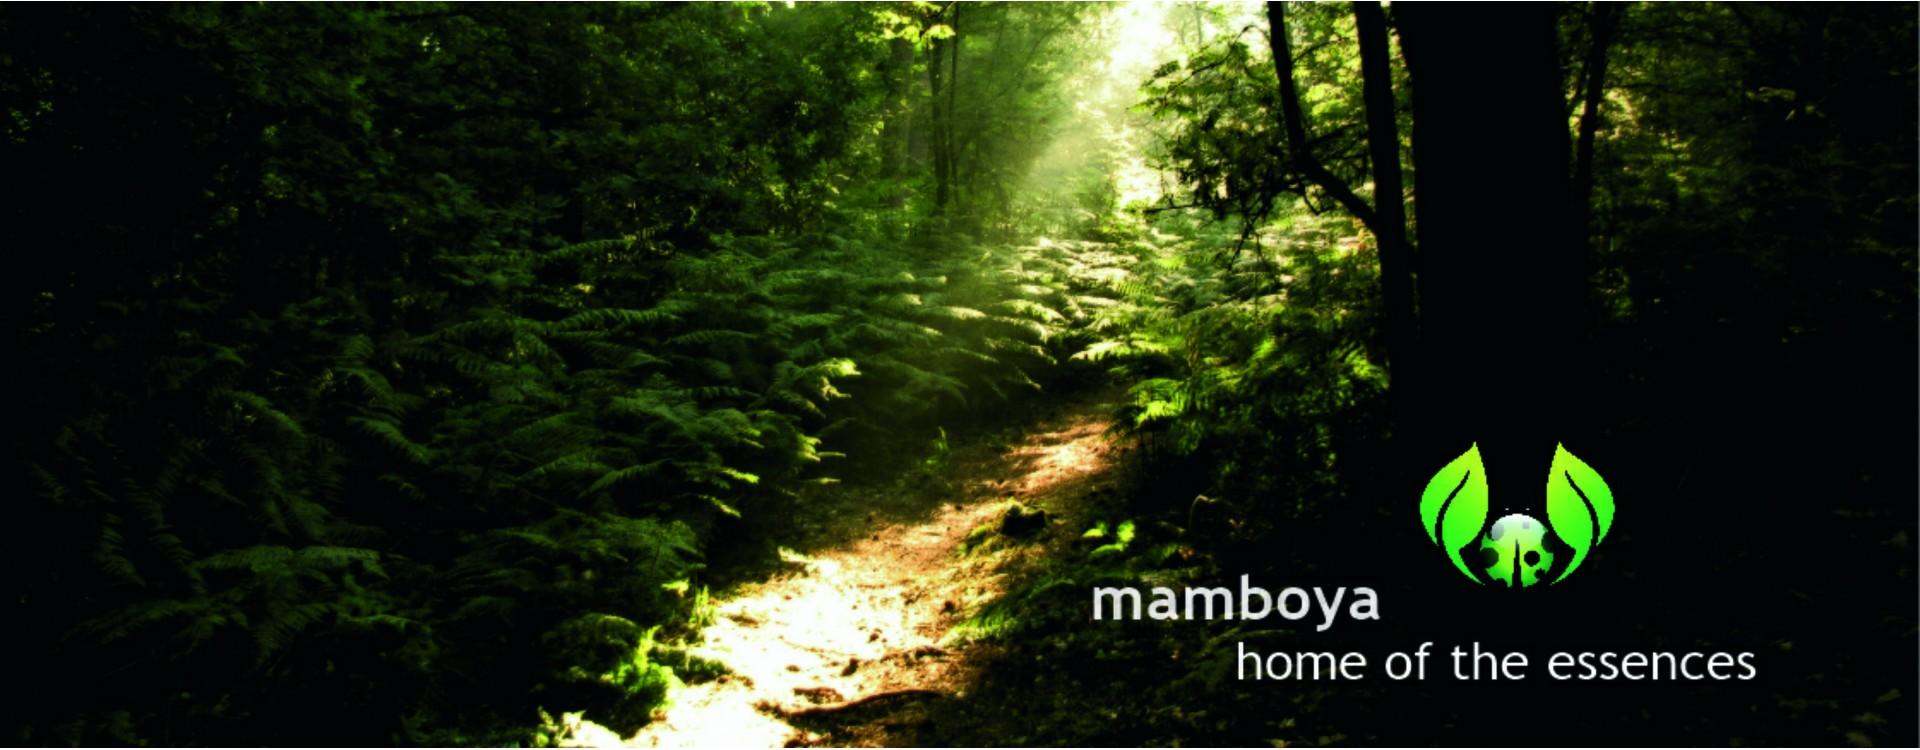 Mamboya Portrait